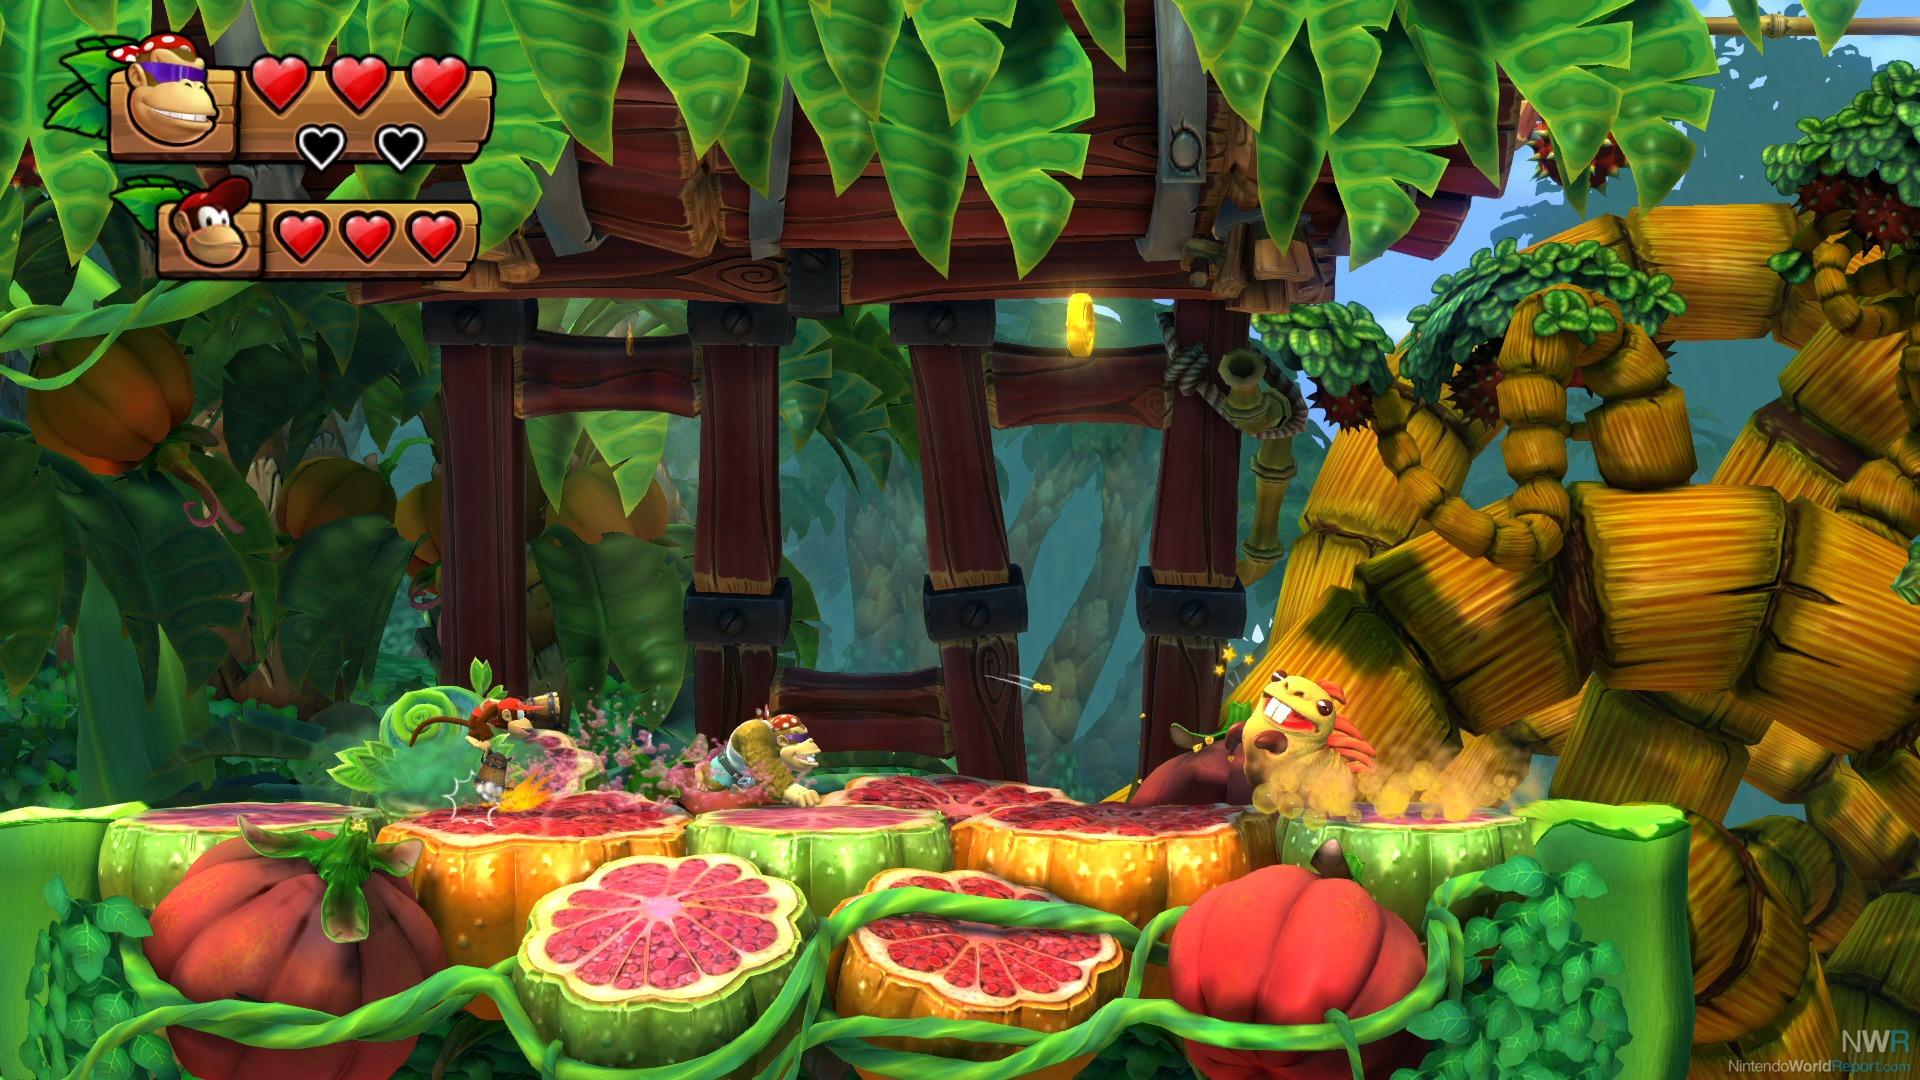 Download Wallpaper Home Screen Donkey Kong - 10  Trends_289864.jpg